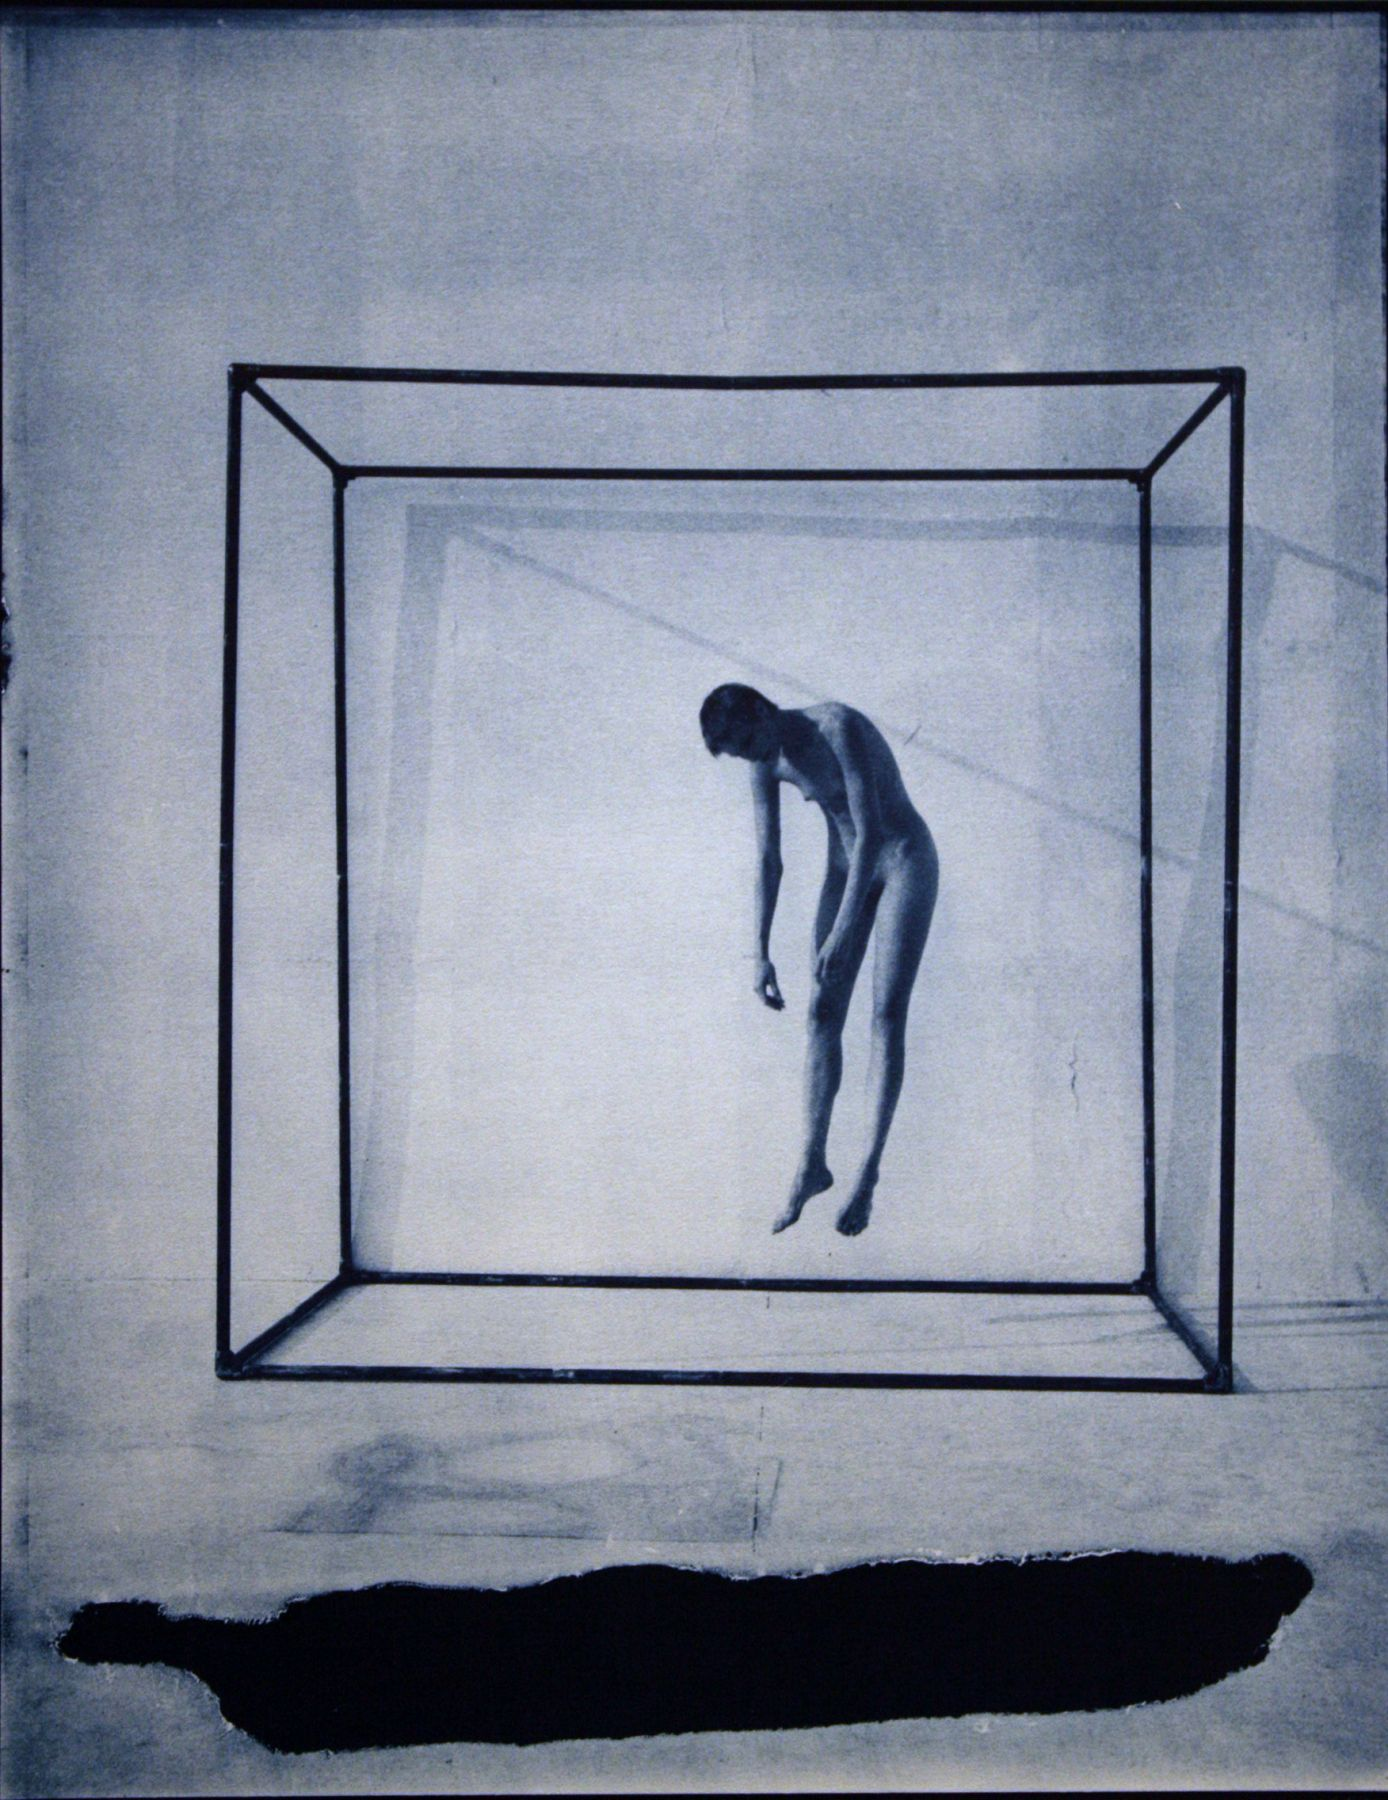 Without Walls, Levitation, Nigel Scott, 1994